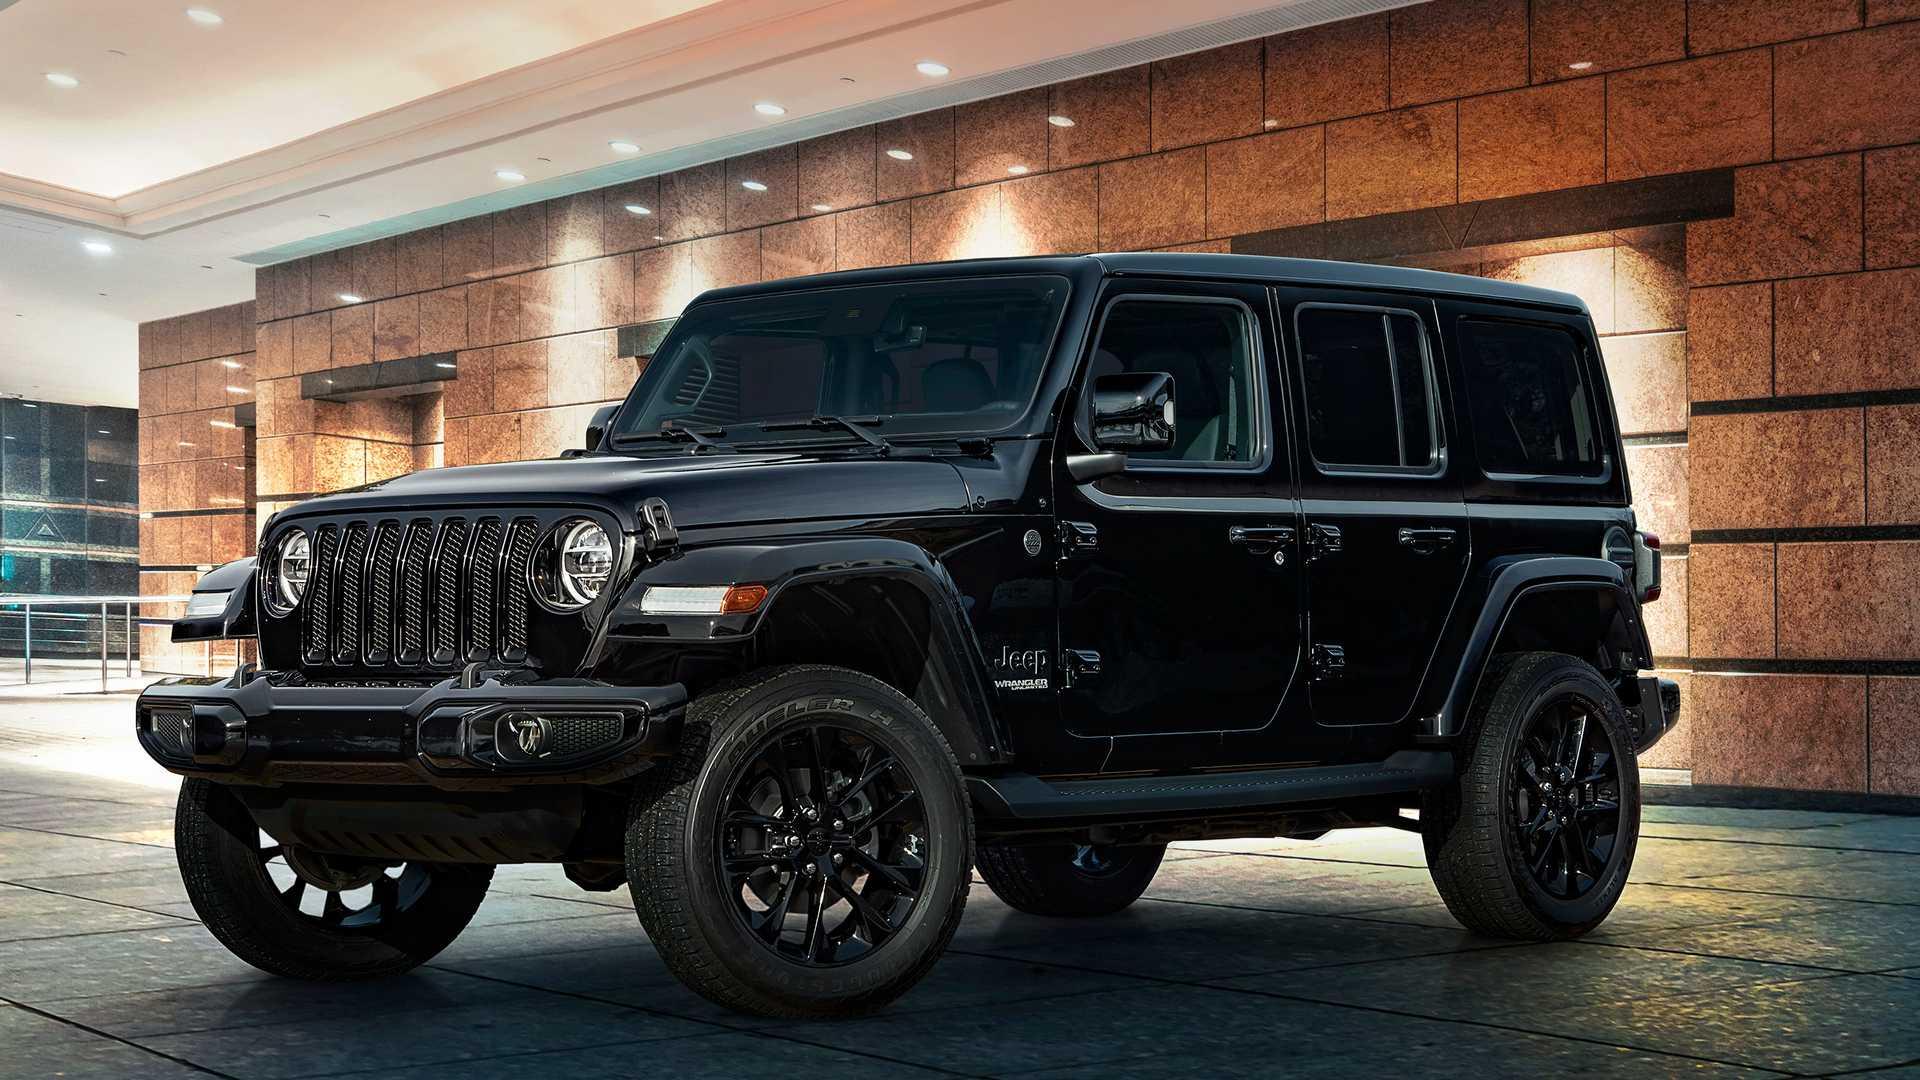 2020-jeep-wrangler-high-altitude-1